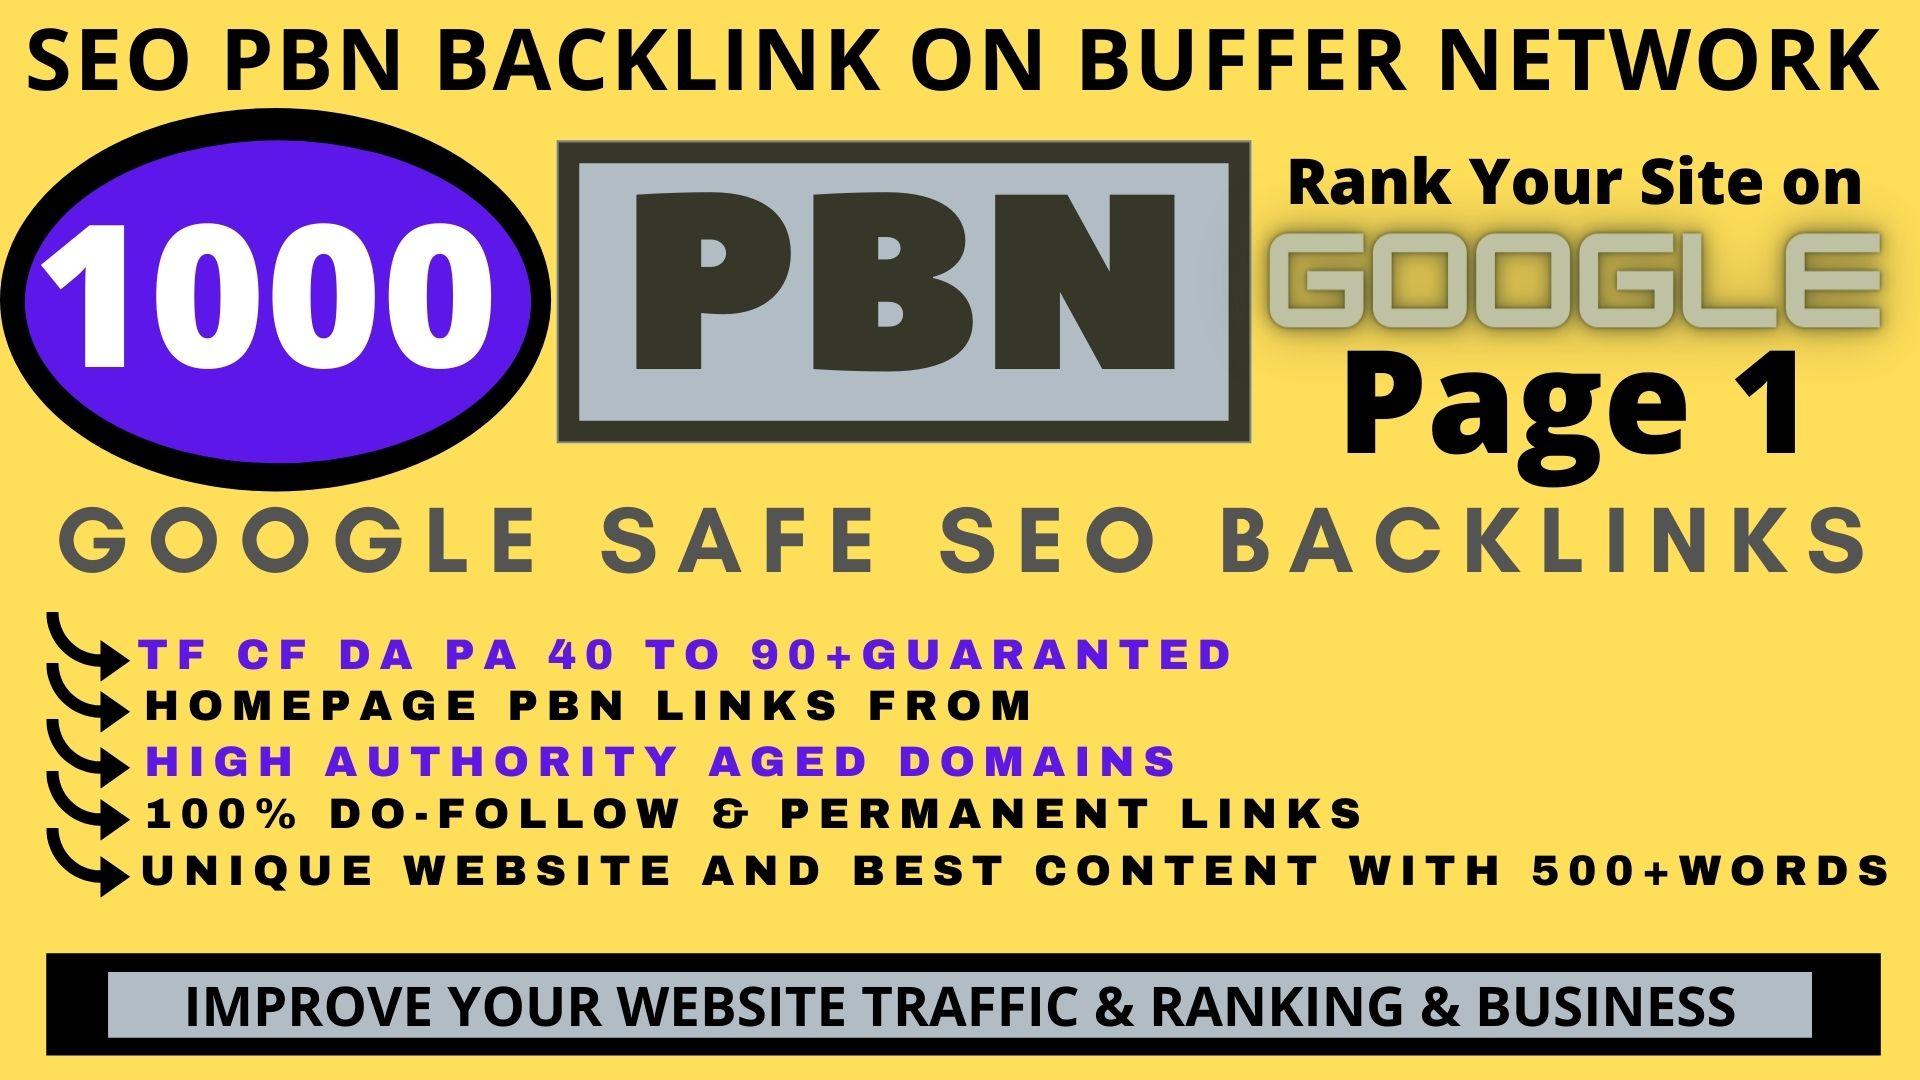 Build Premium 1000 PBN & WEB 2.0 Backlink with Permanent Dofollow & High DA PA TF CF